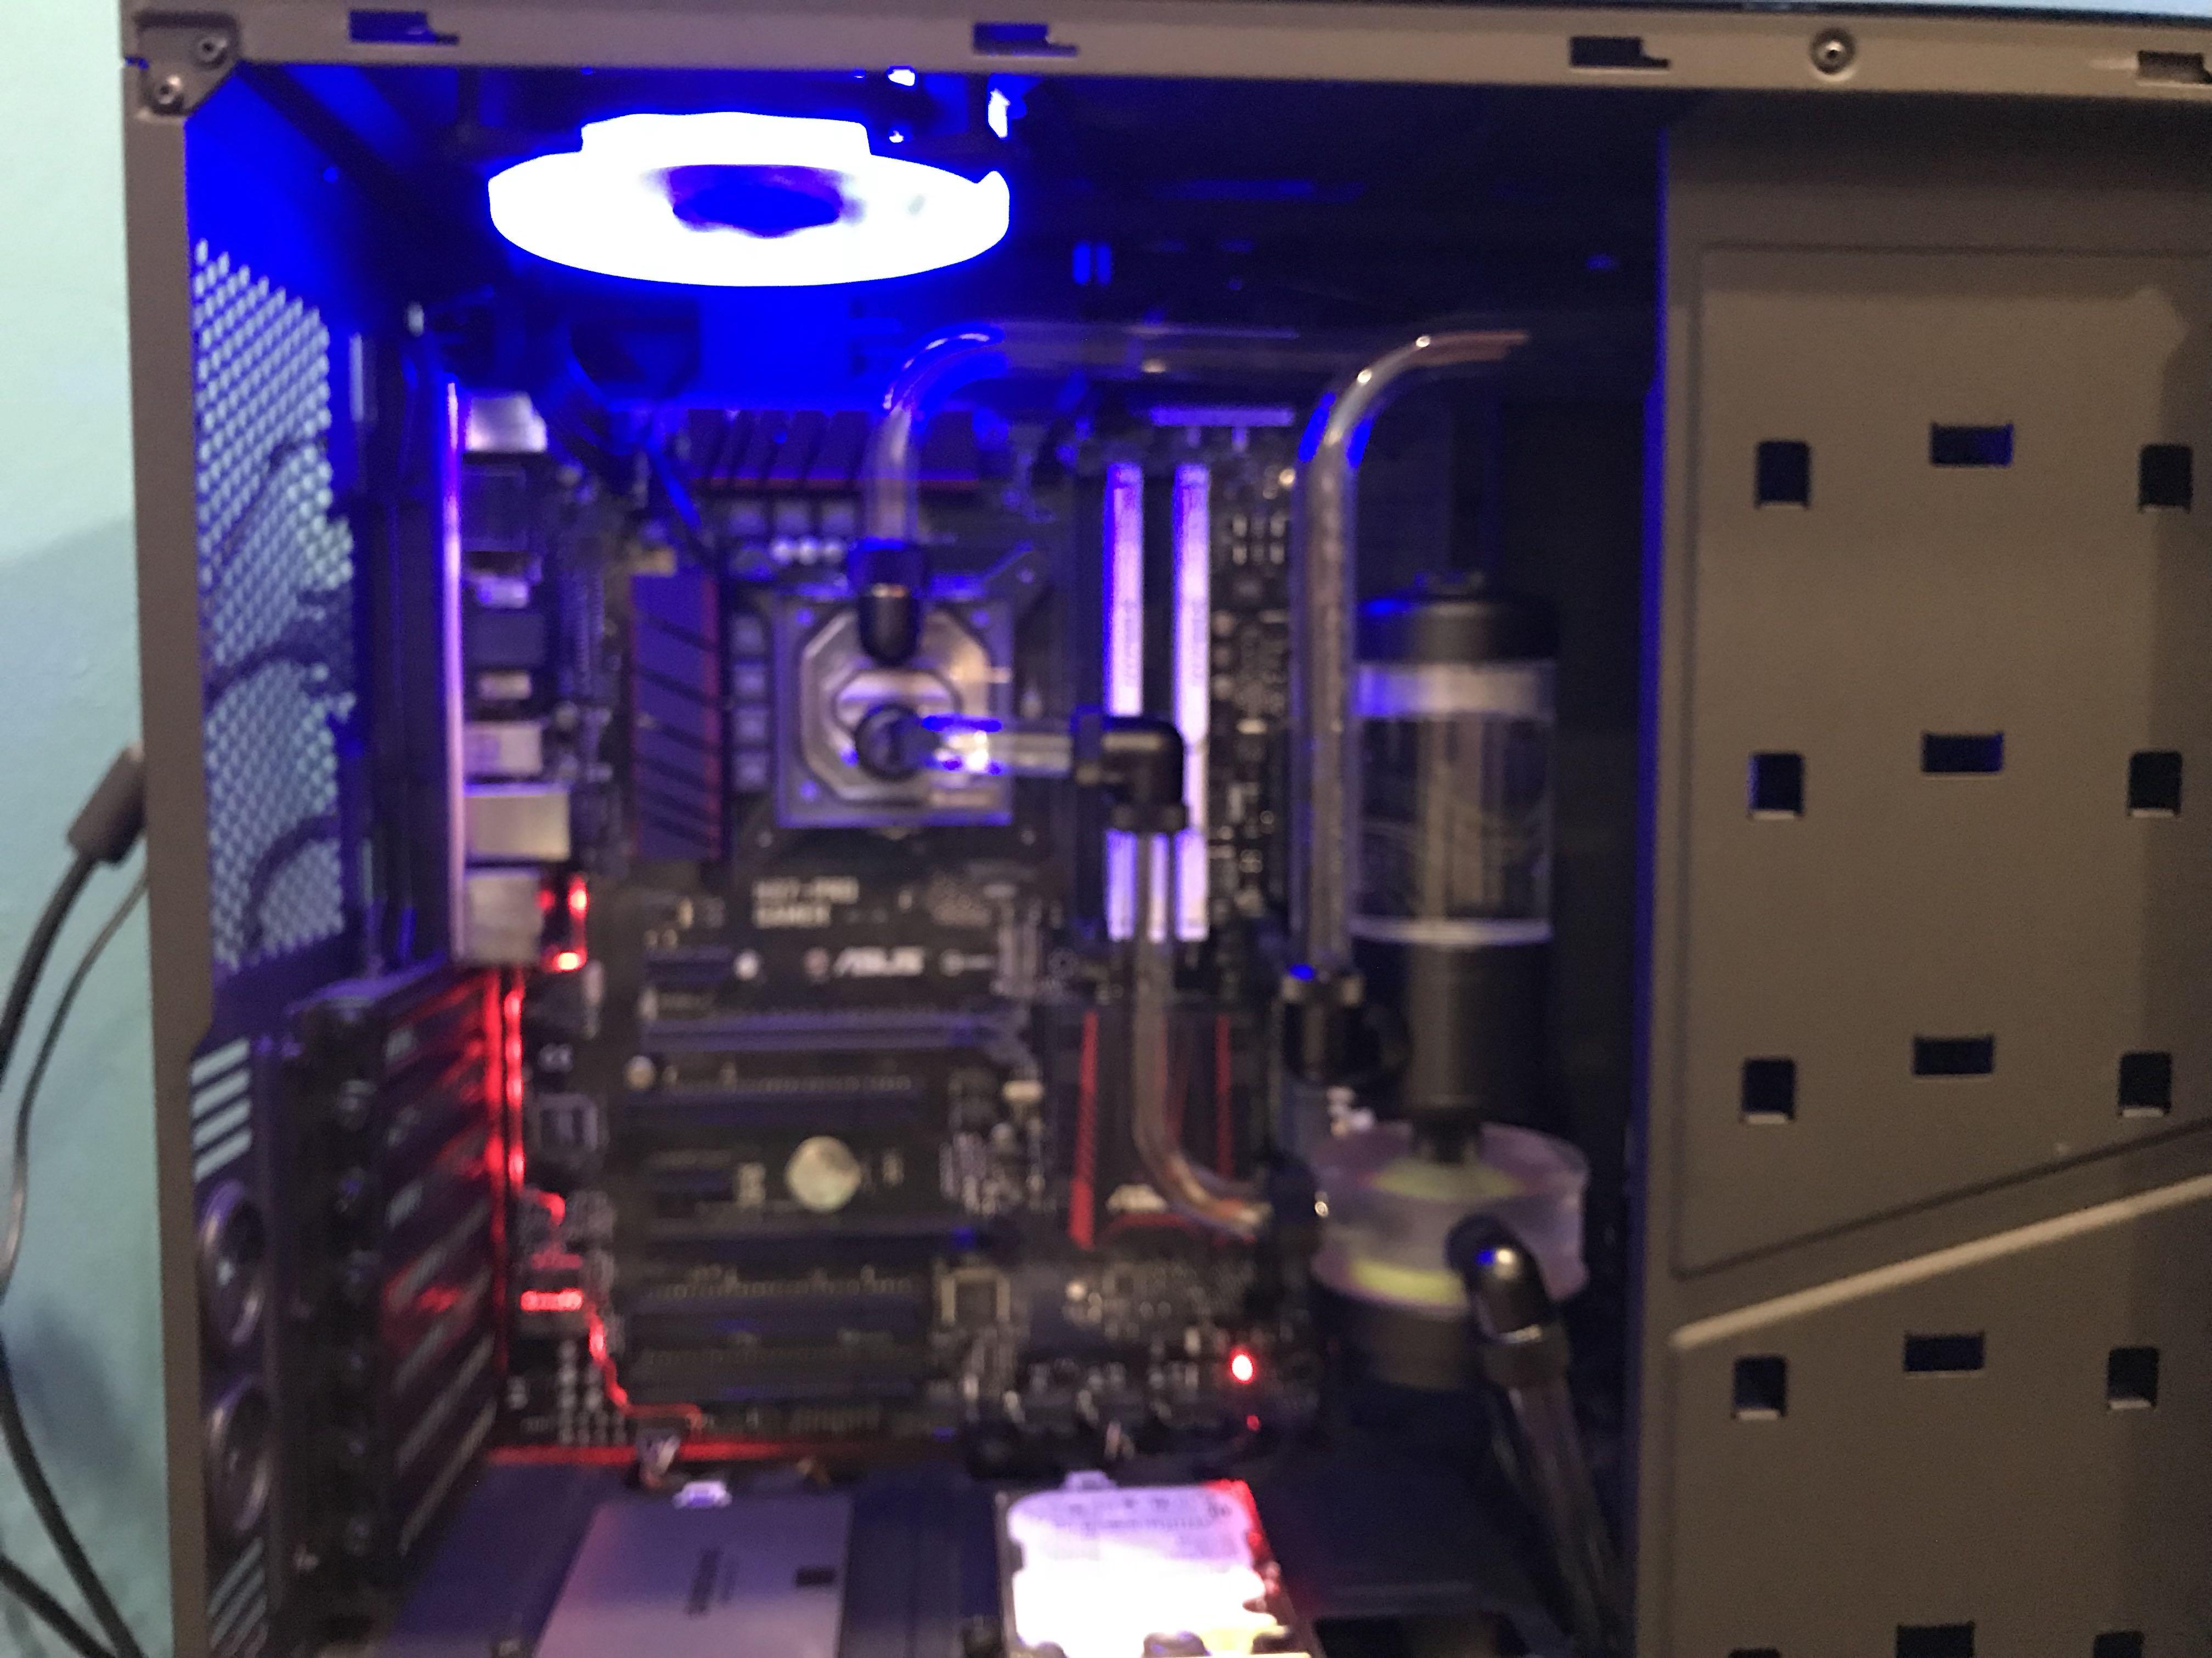 Watercooling for CPU